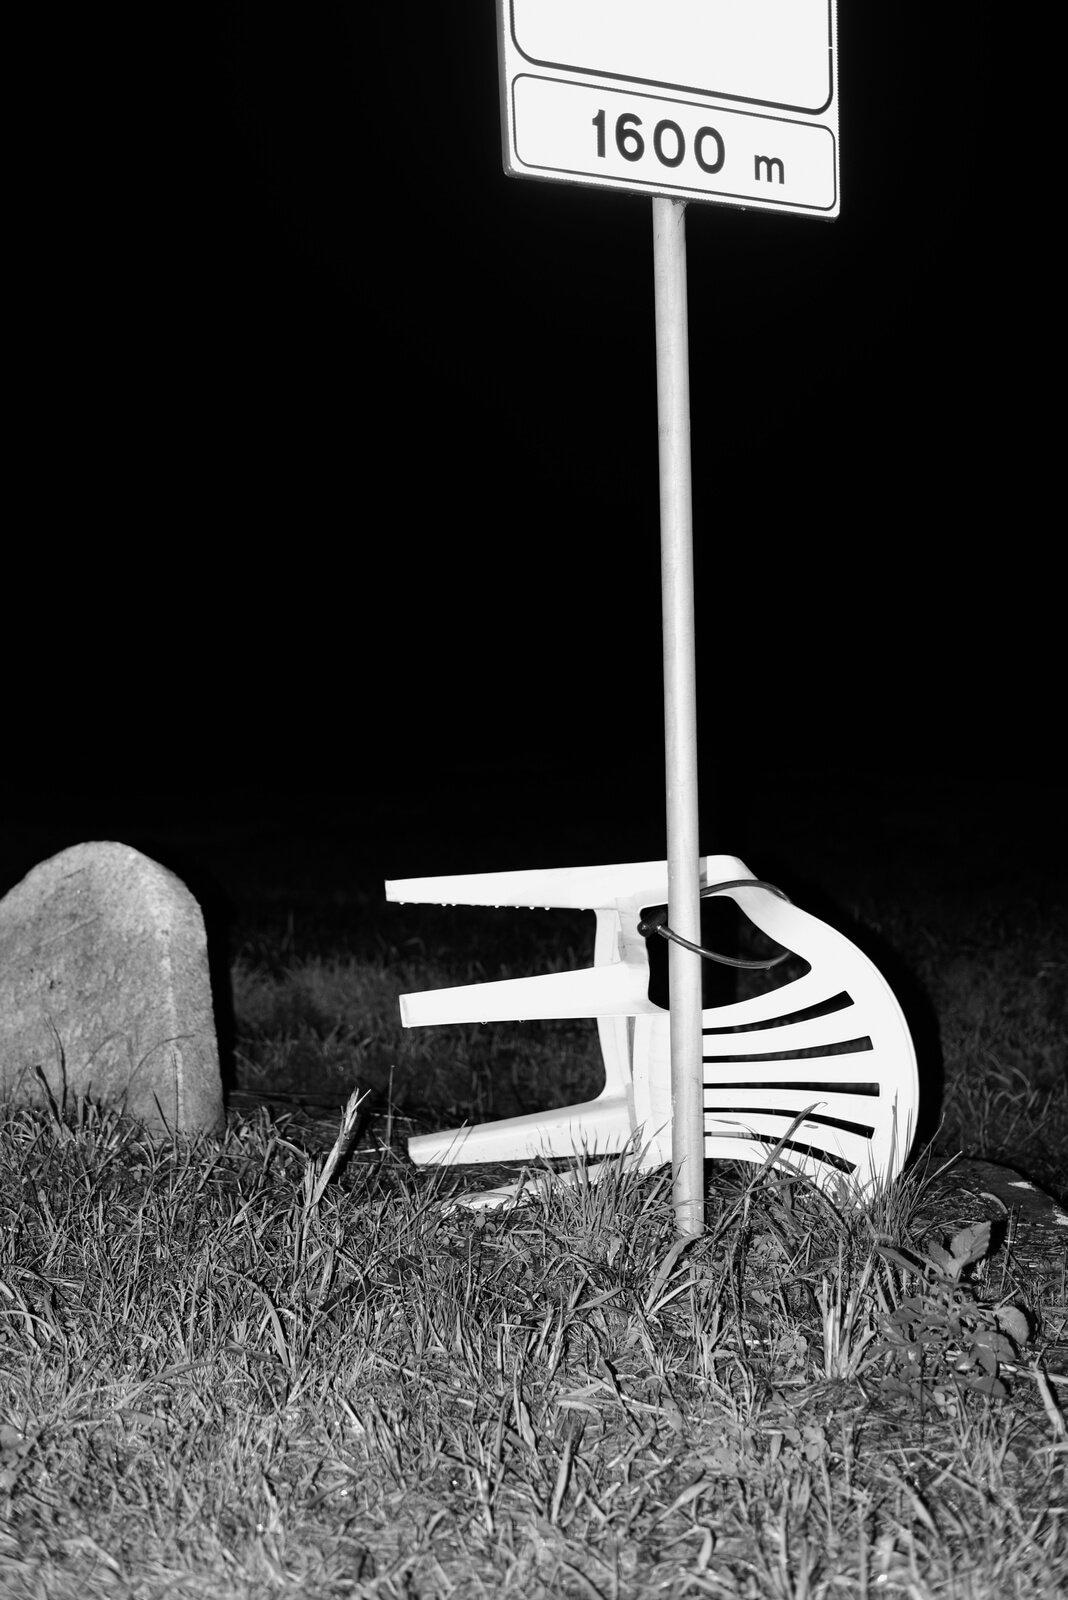 12_The-Absence_Attilio-Solzi